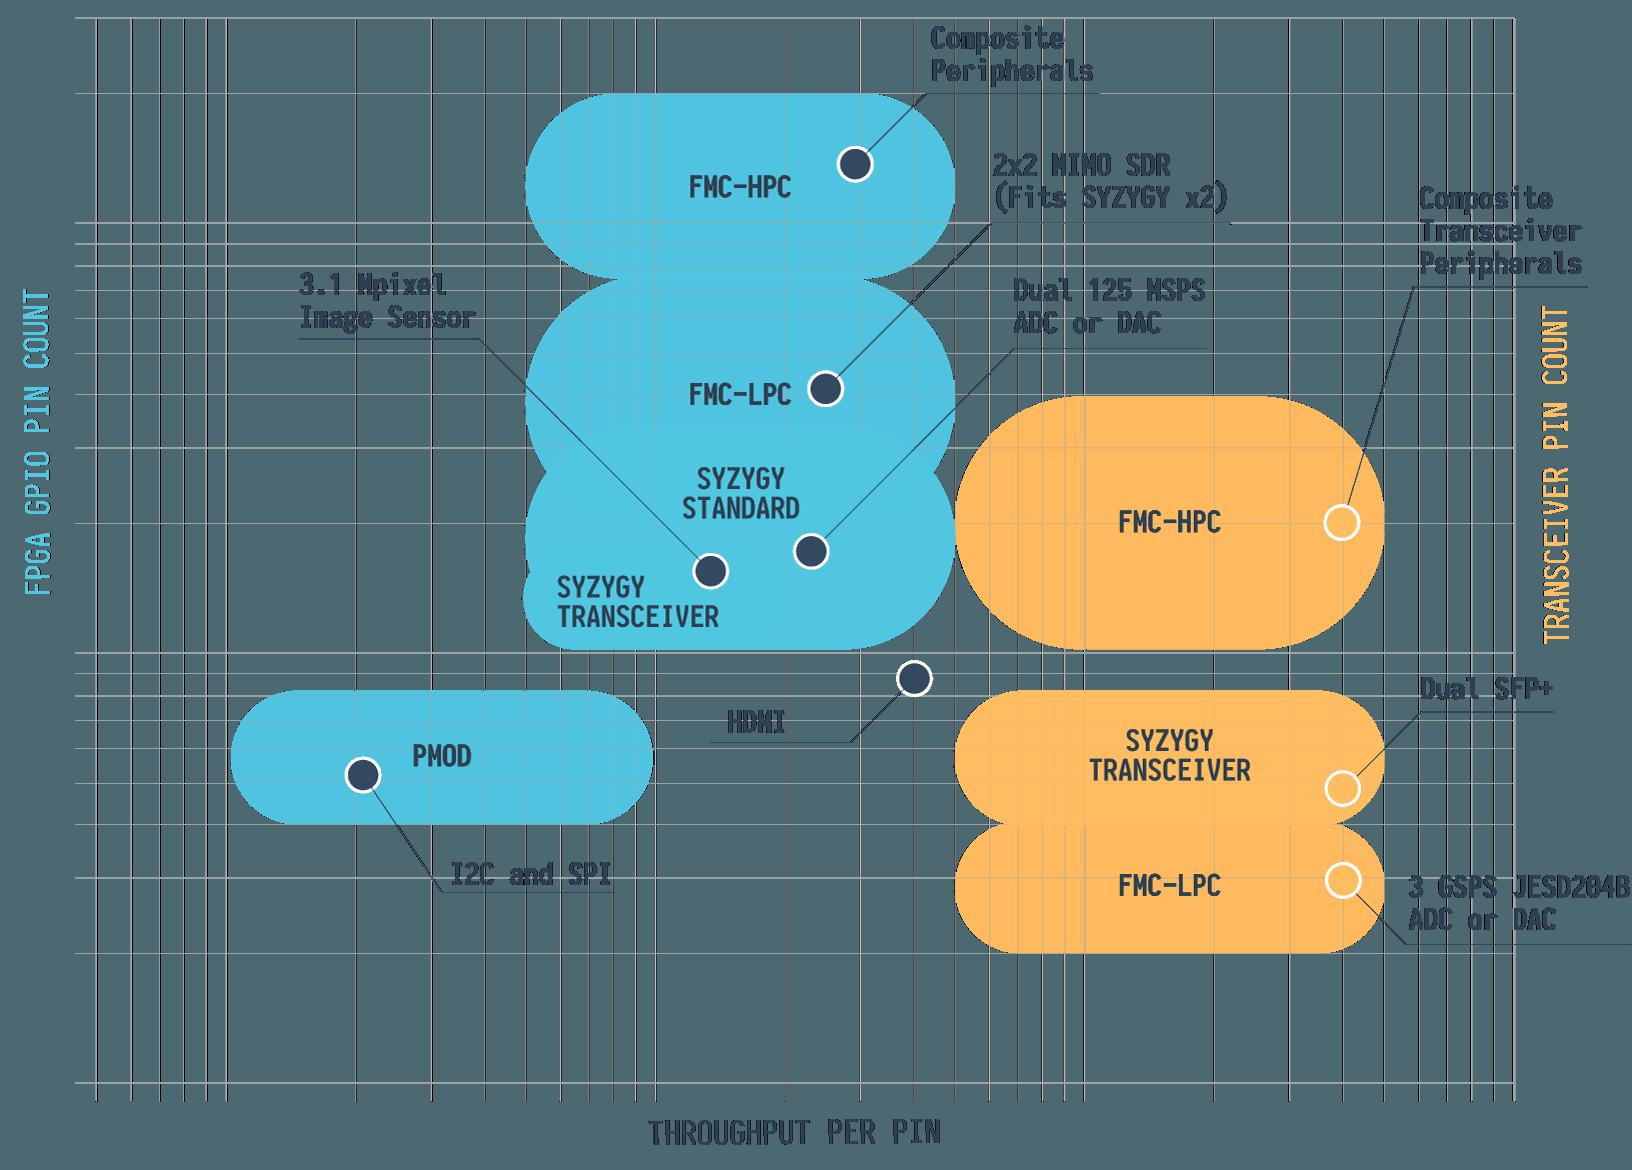 FPGA Interfaces SYZYGY